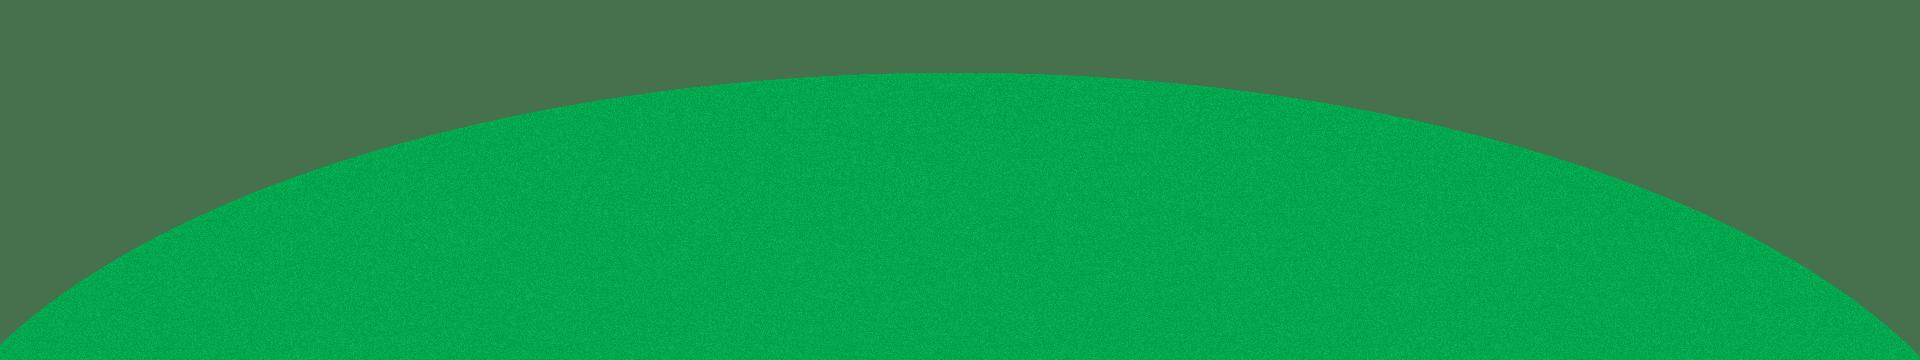 archgreen